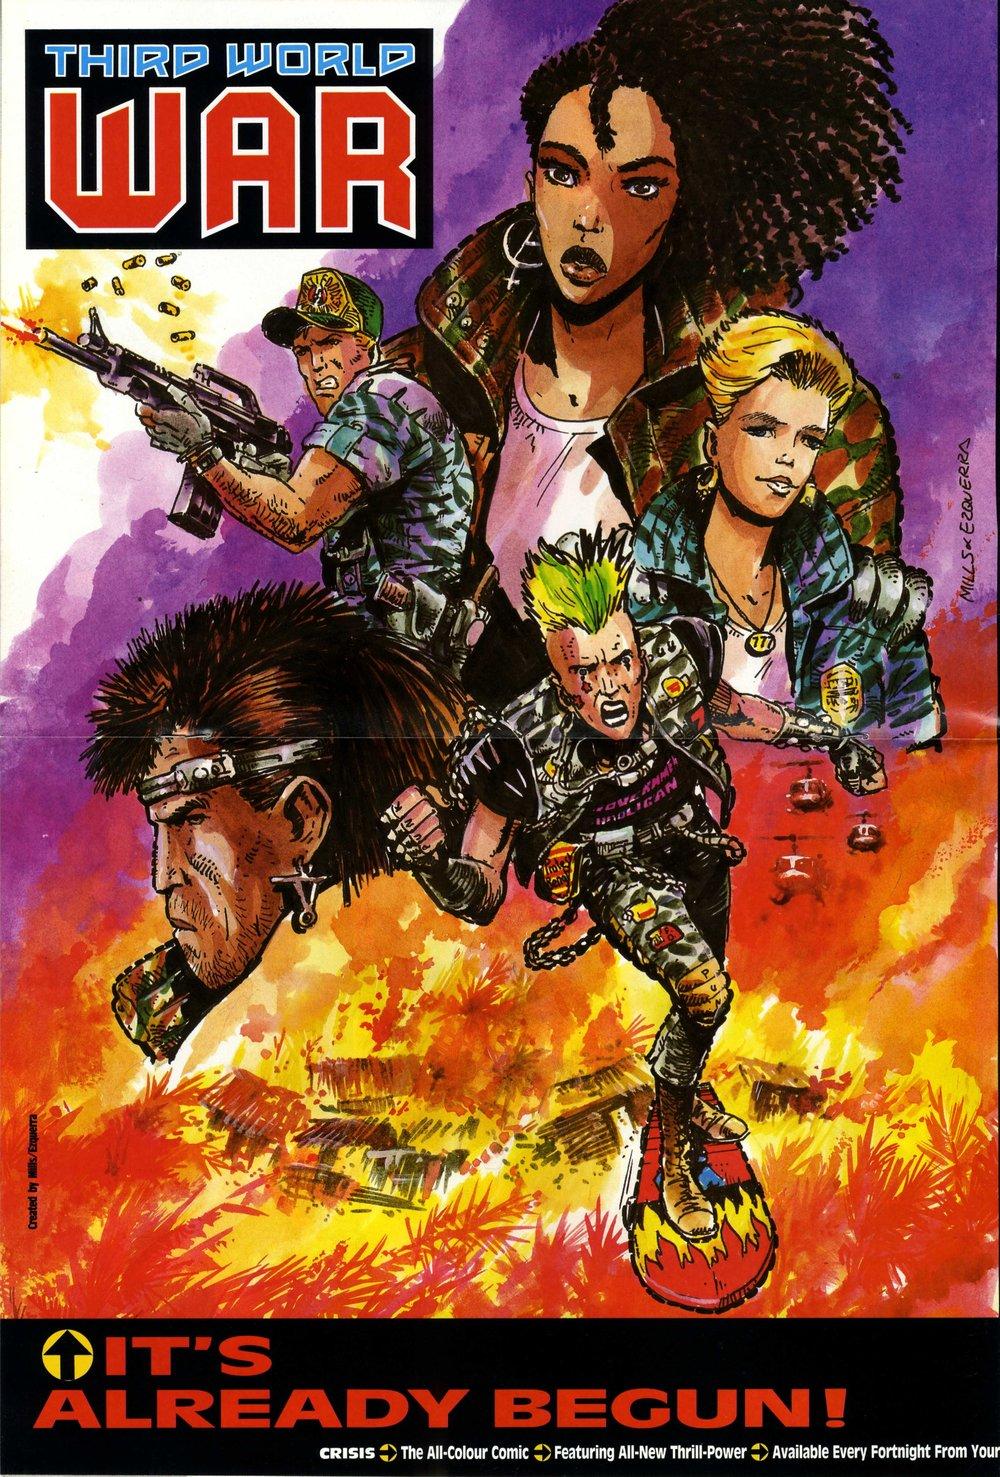 Crisis poster: Carlos Ezquerra (artist)